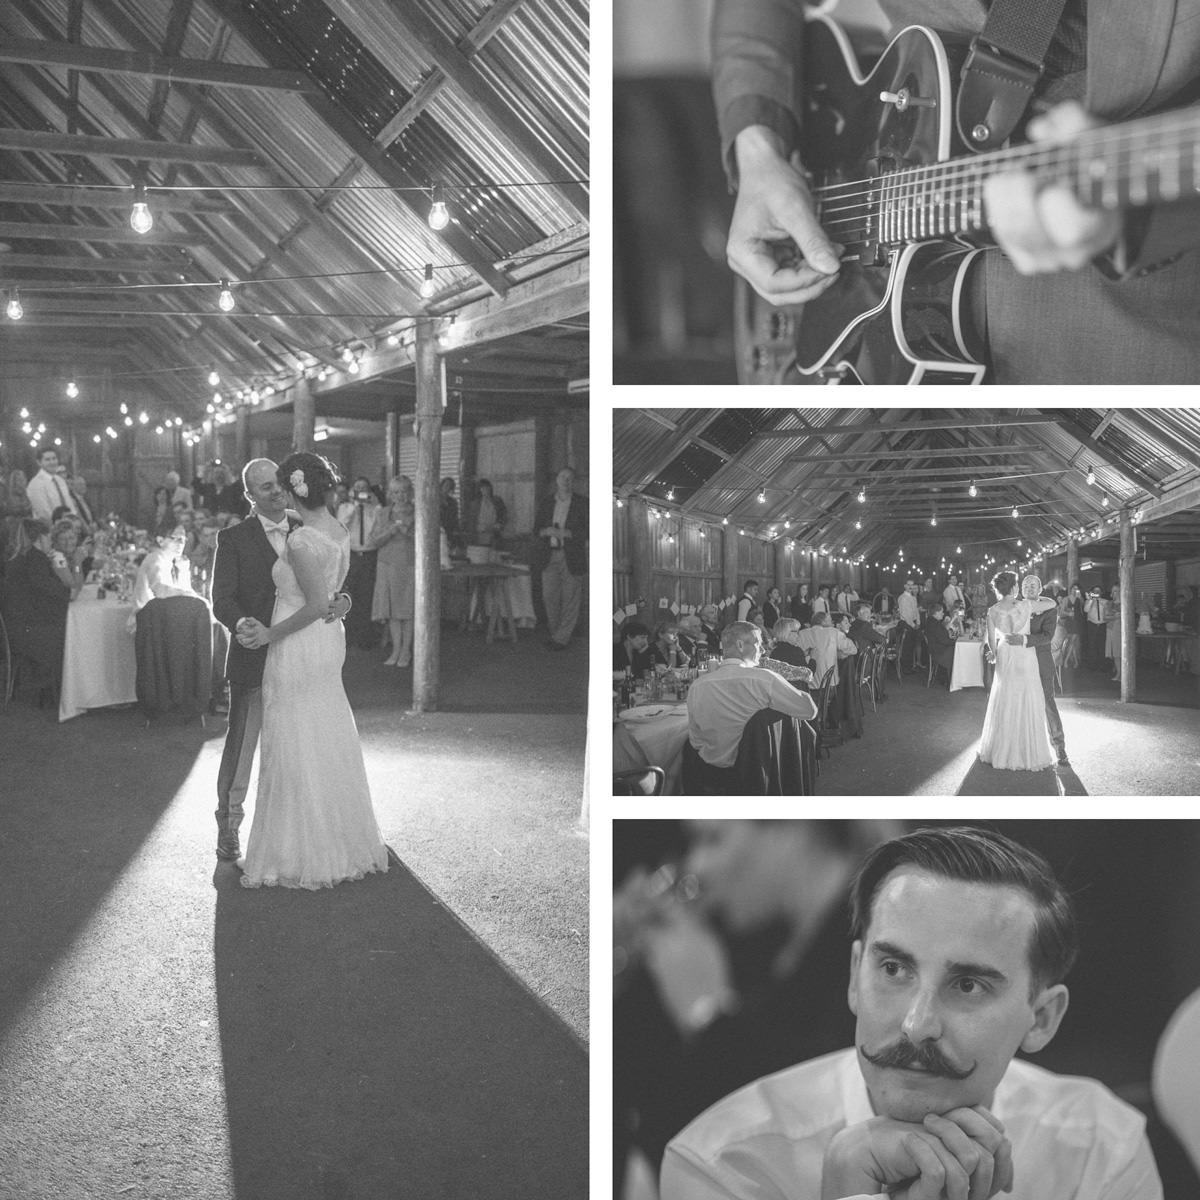 dance in a barn - fairly light wedding photography